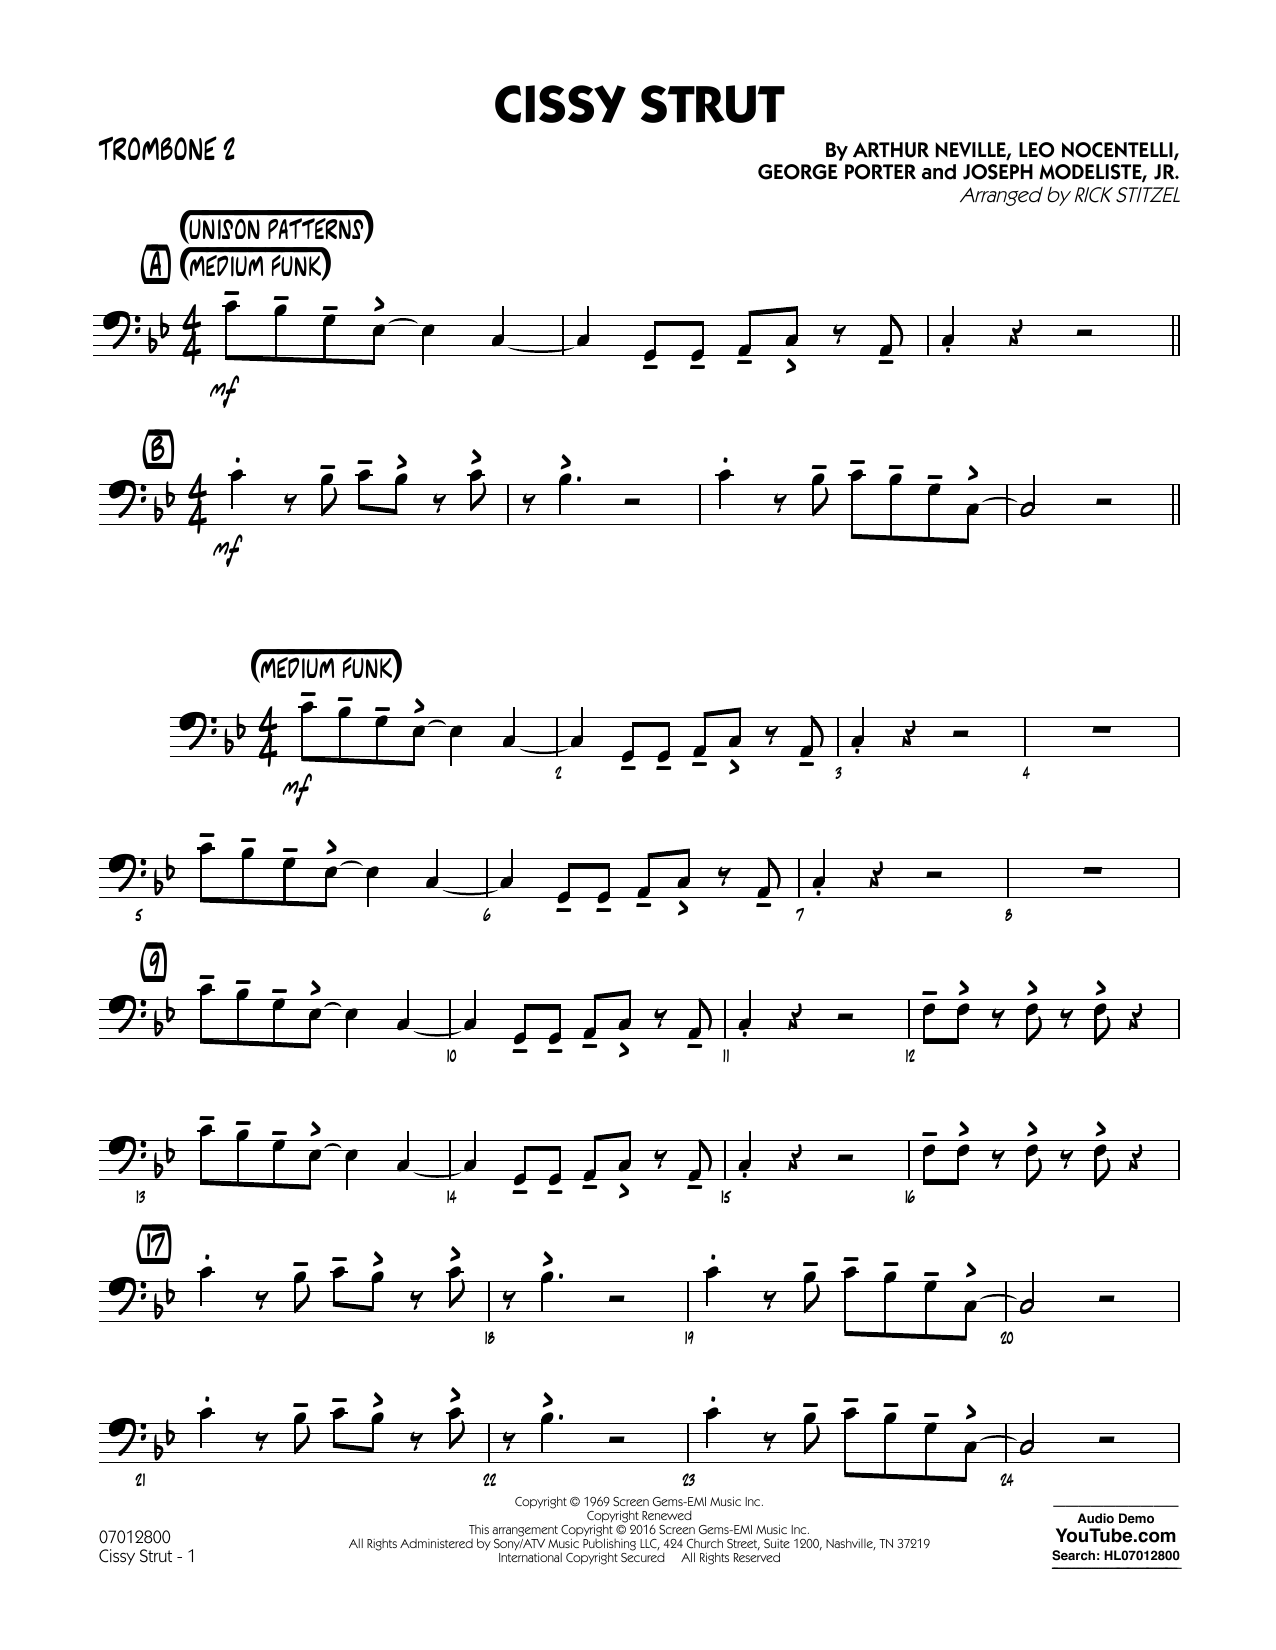 Rick Stitzel Cissy Strut - Trombone 2 sheet music notes and chords. Download Printable PDF.